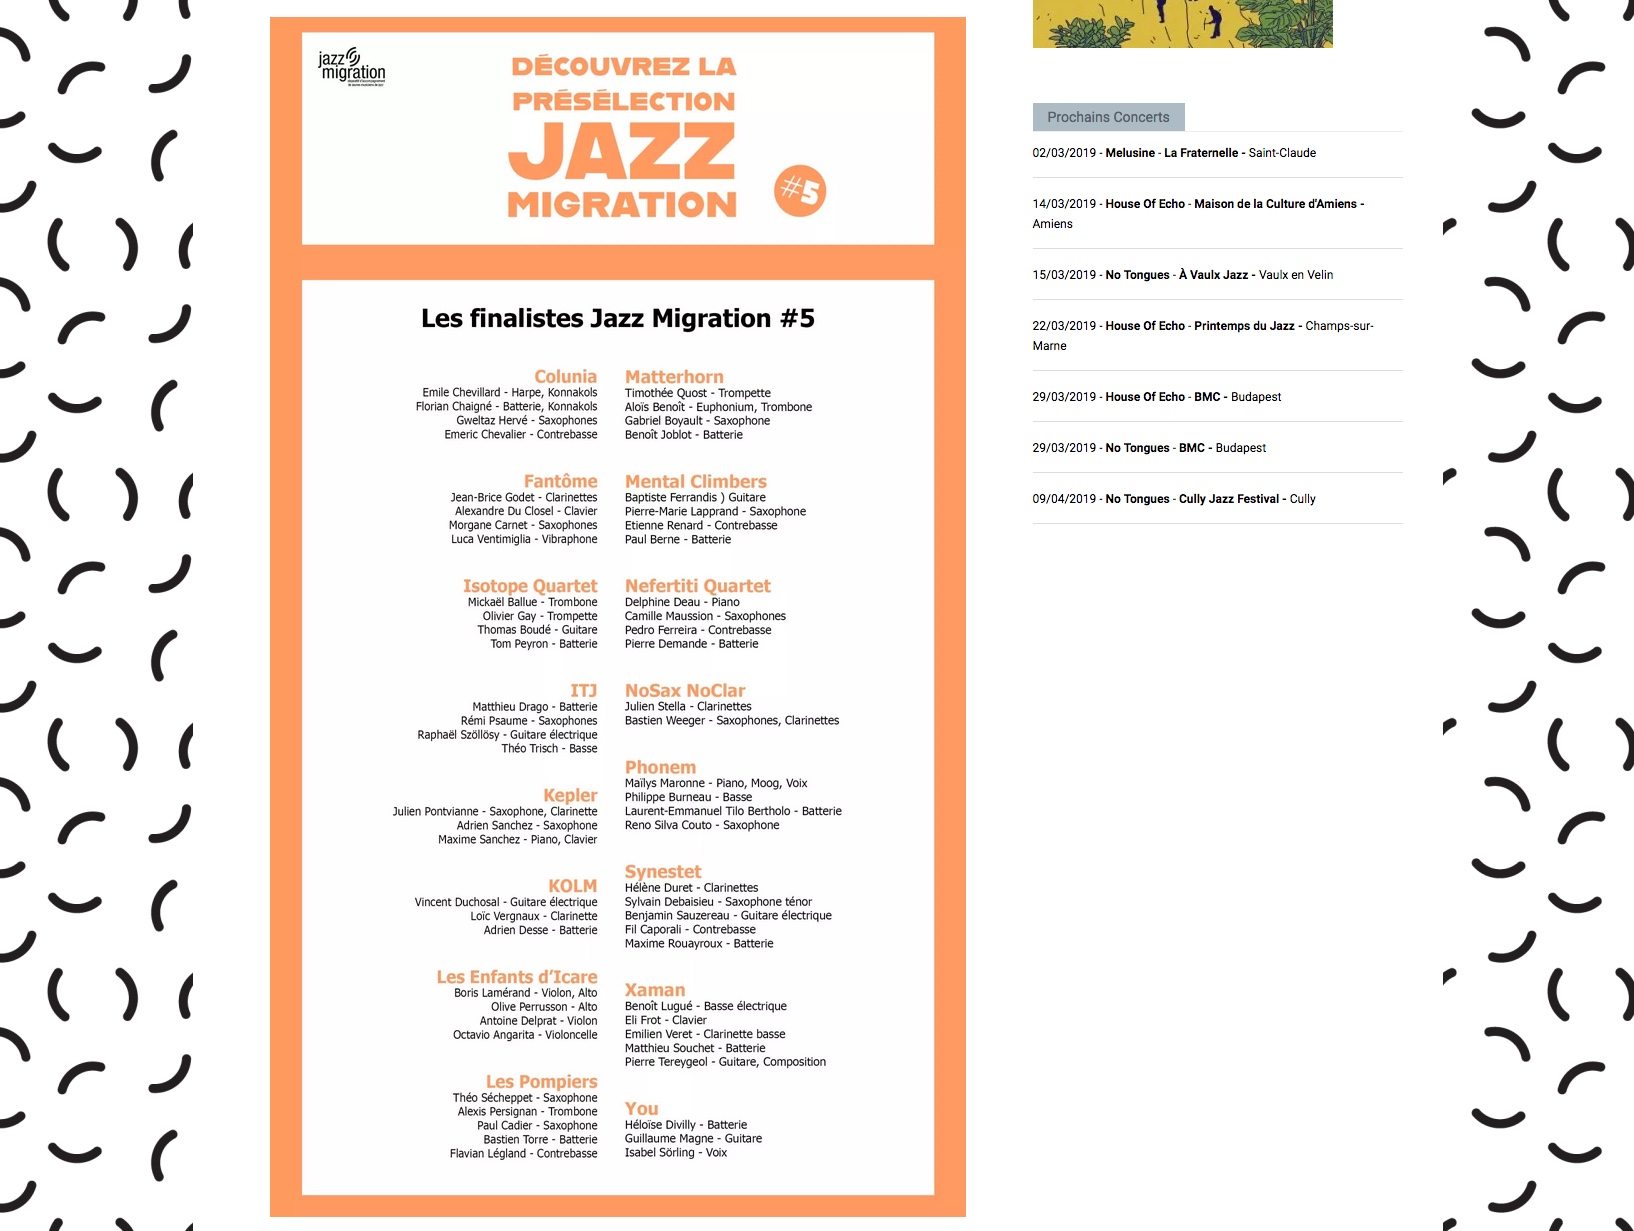 Jazz Migration #5